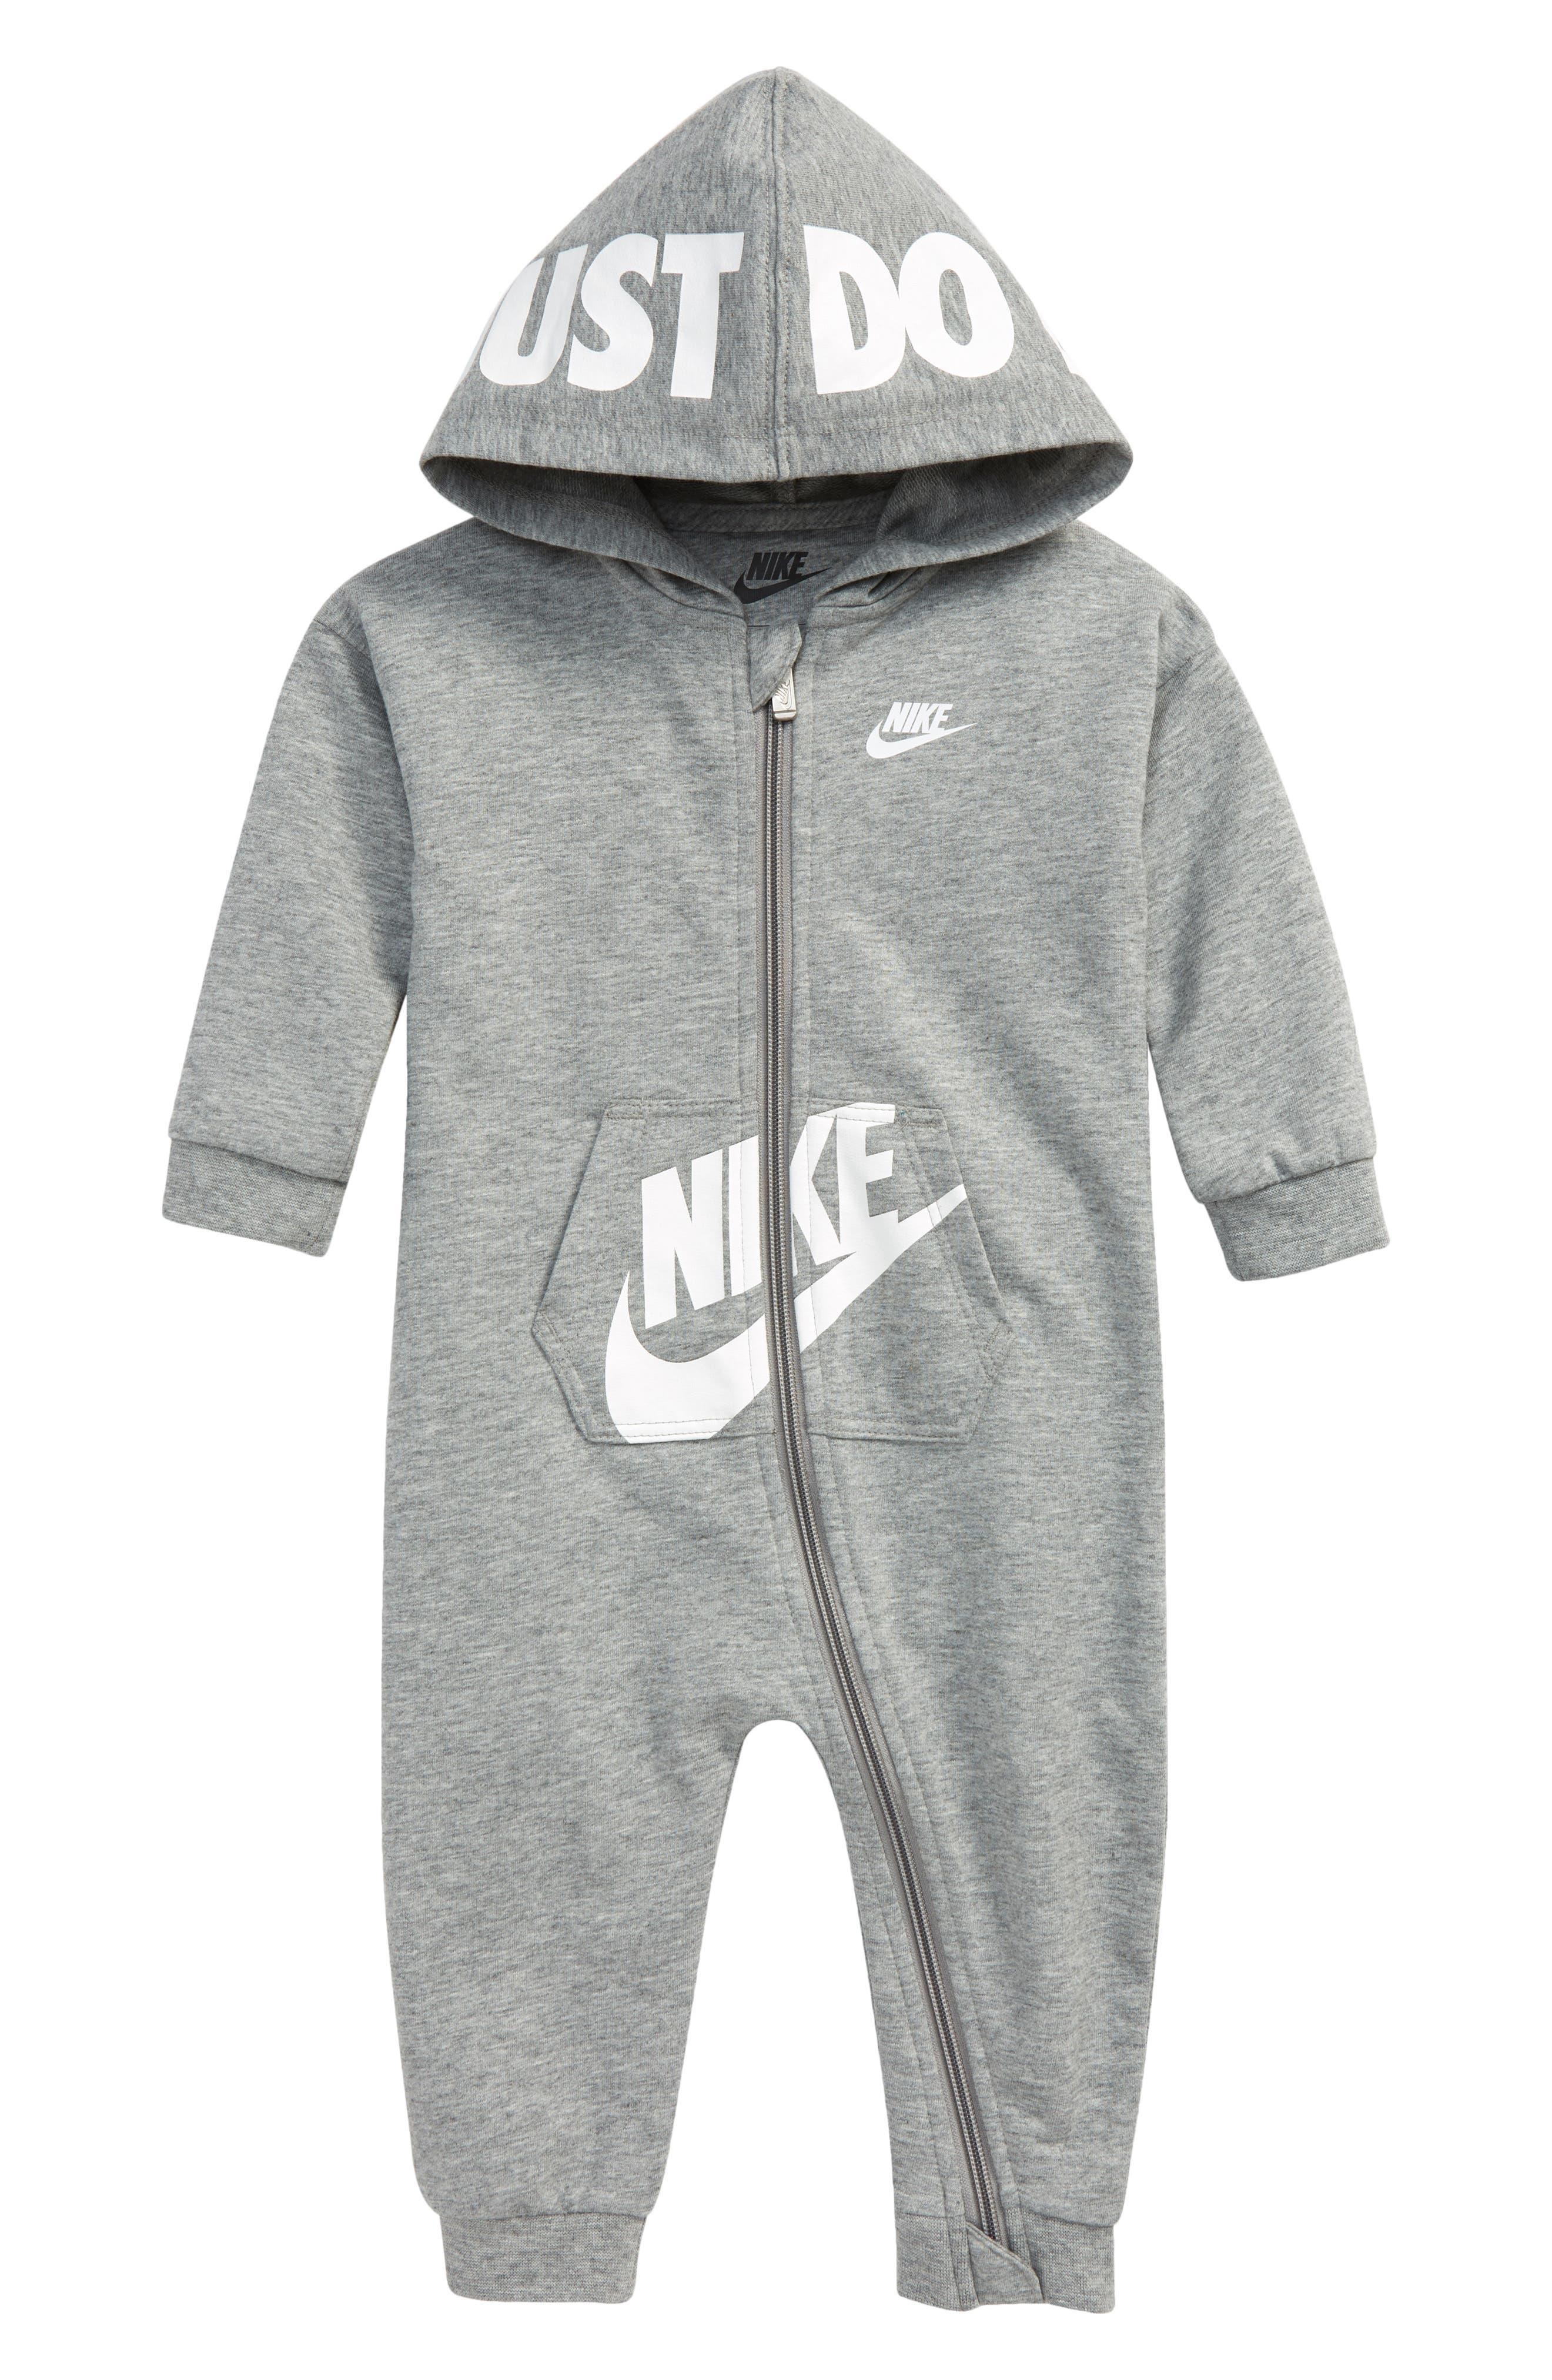 Baby Nike Clothing, Shoes